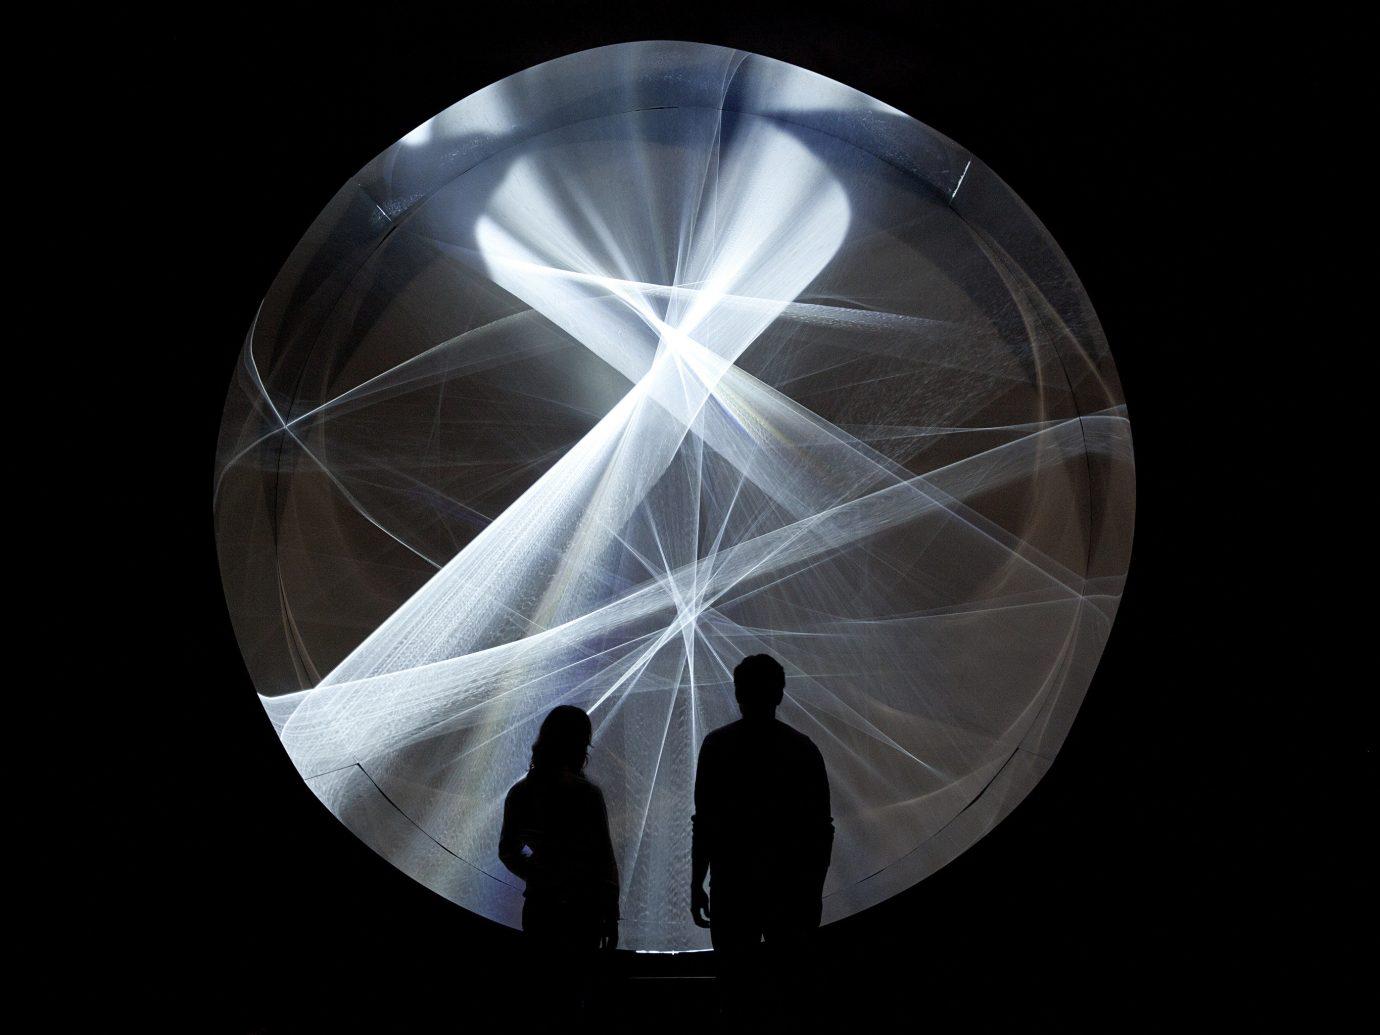 Arts + Culture light circle sandglass organ sphere shape reflection symmetry dark